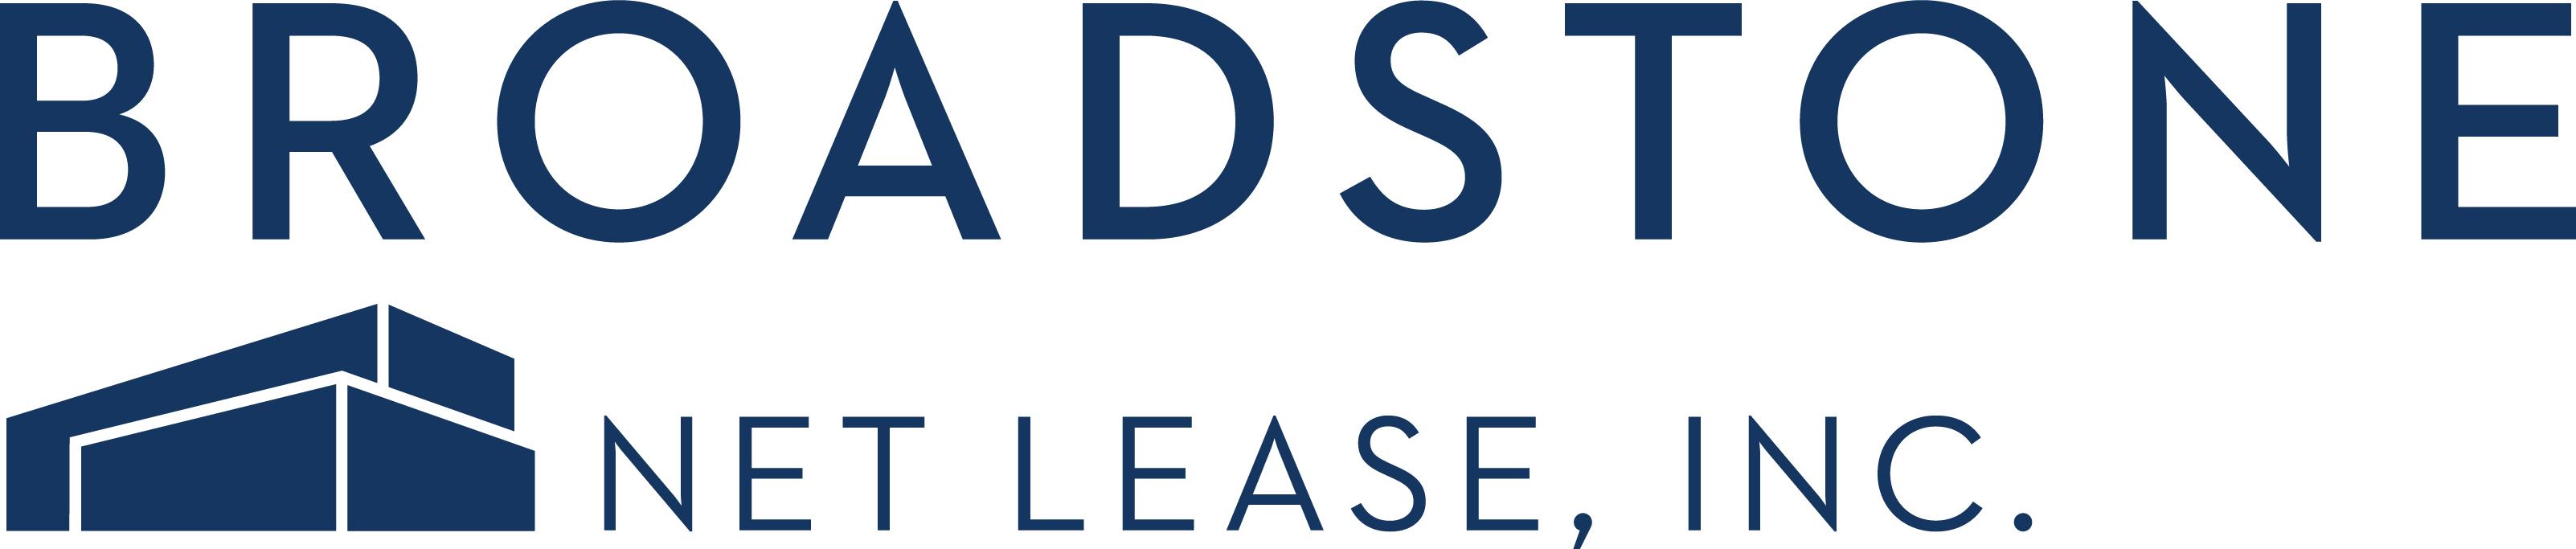 Broadstone Net Lease, Inc Company Logo